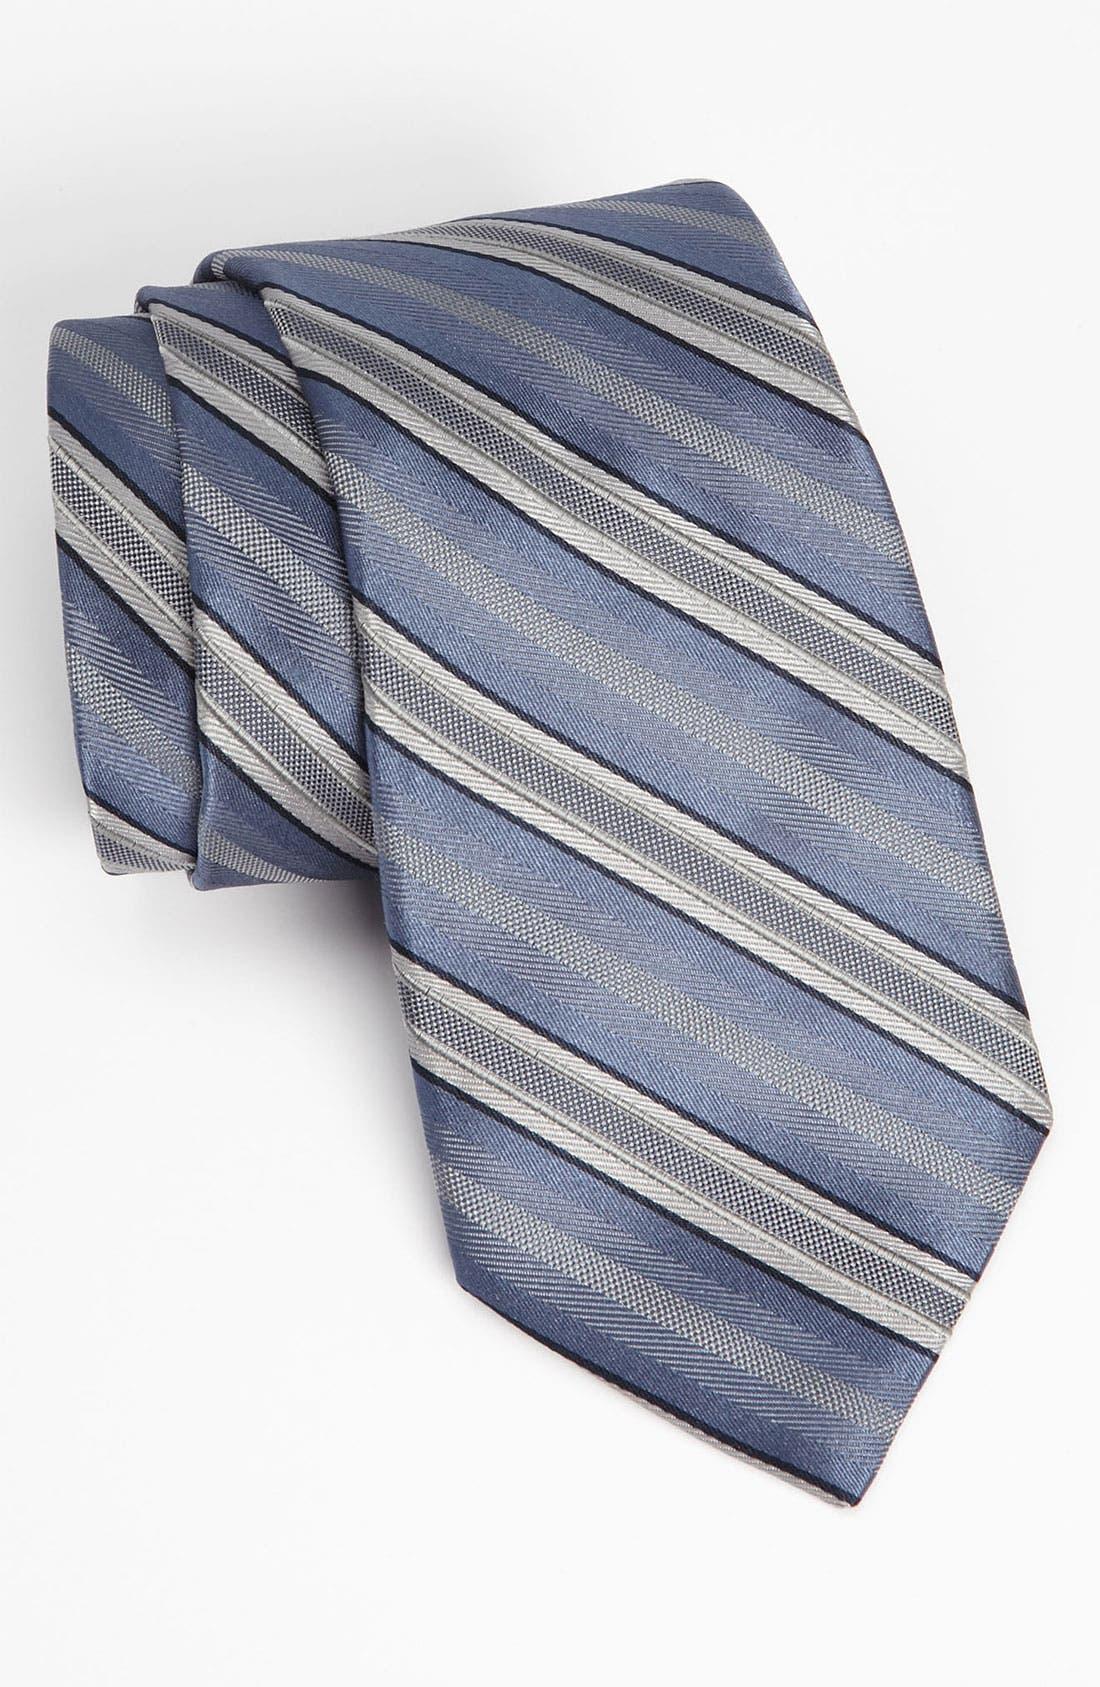 Main Image - Michael Kors Woven Silk Tie